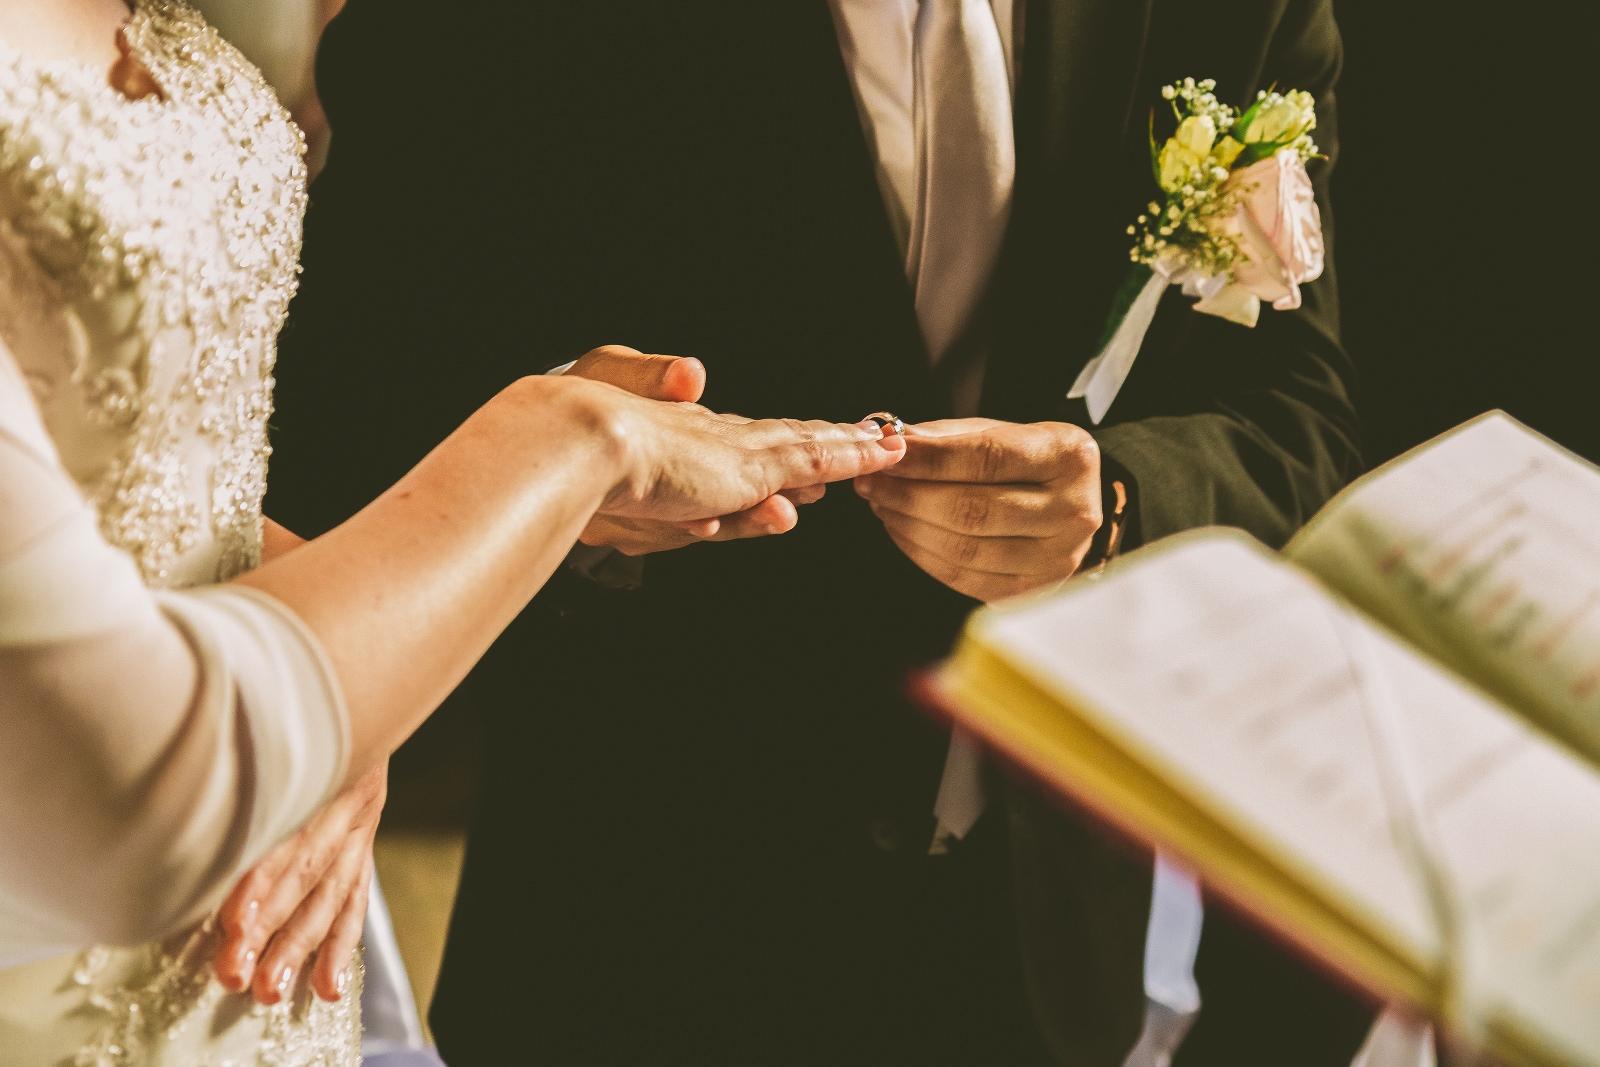 Vjenčanje u Zagrebu Robert Kale Weddings